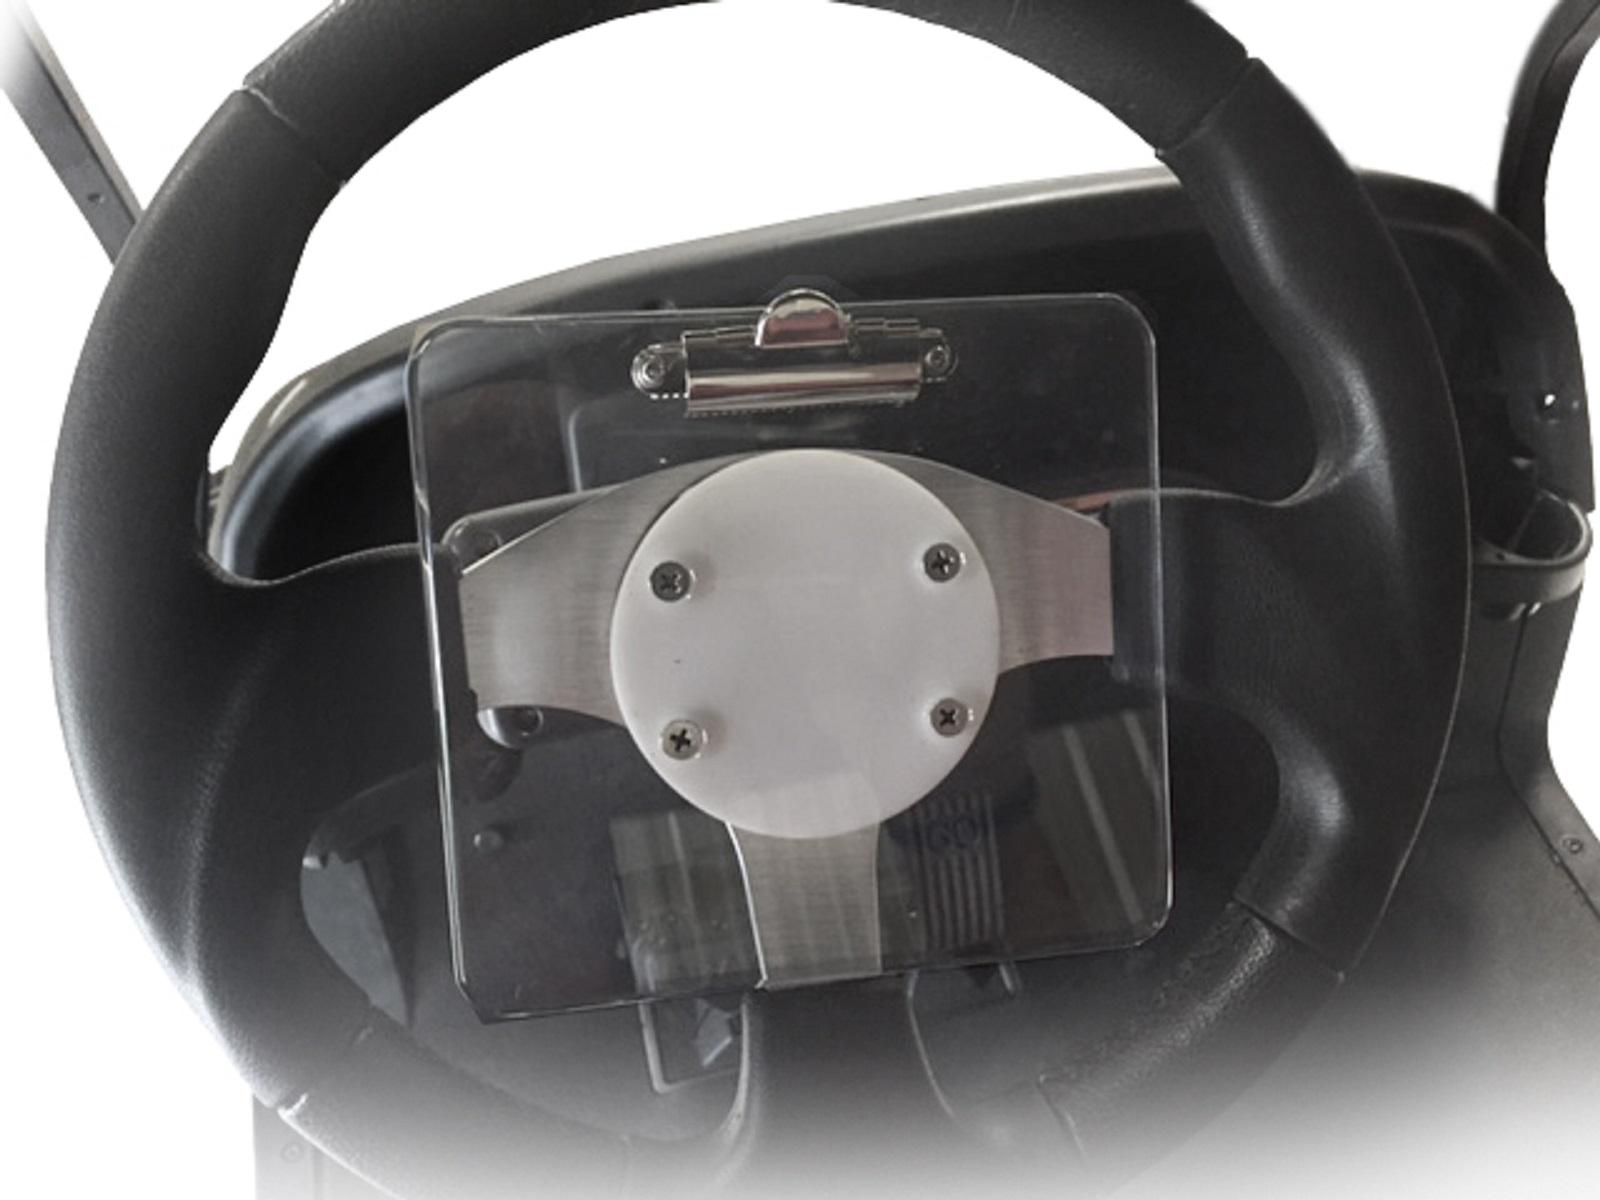 Madjax Golf Cart Score Card Holder for Aftermarket Steering Wheels on e-z-go golf cart parts, club car golf cart parts, jake's golf cart parts, franklin golf cart parts, yamaha golf cart parts, nivel golf cart parts,